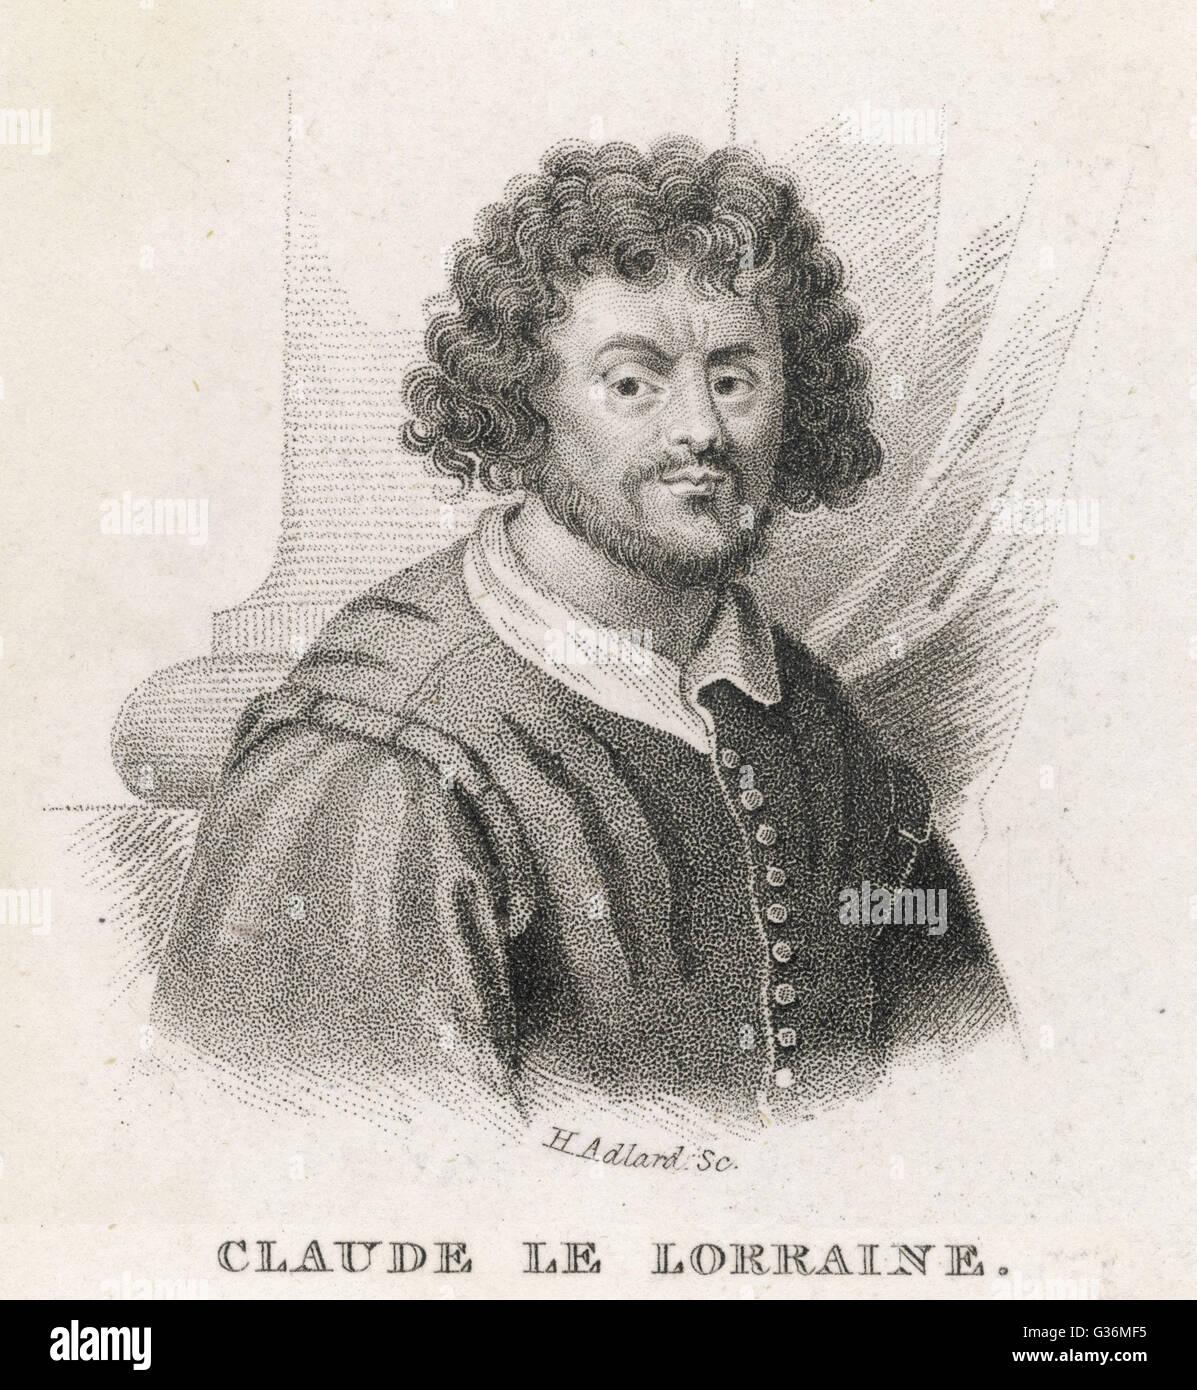 Claude Le Lorrain (1600-1682) French Artist. - Stock Image